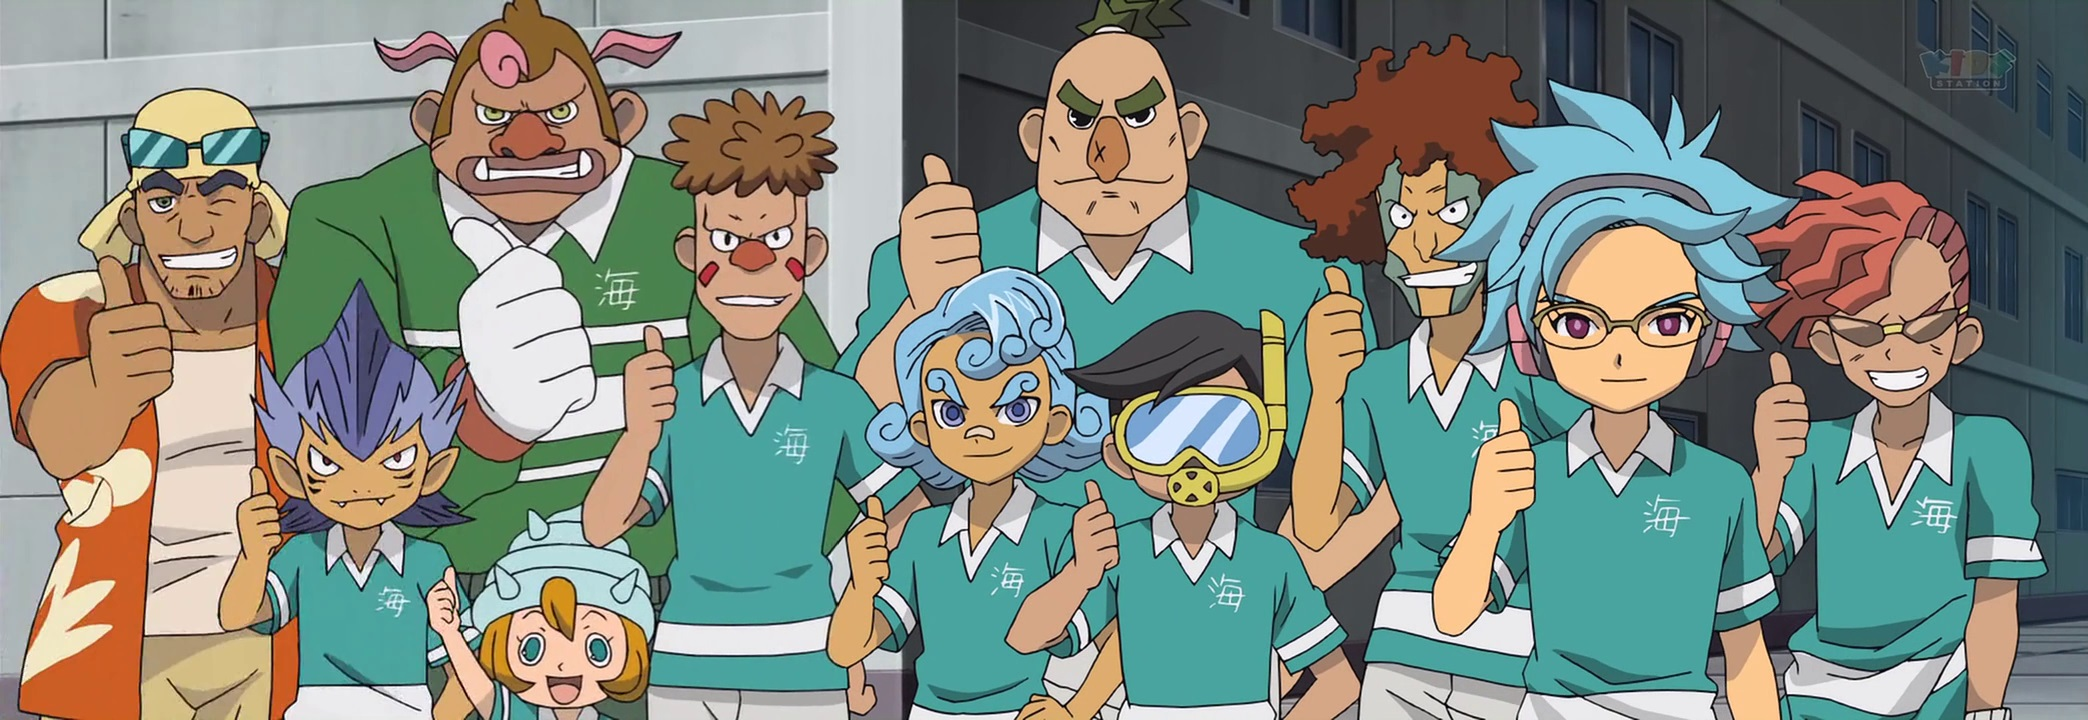 Oumihara inazuma eleven wiki fandom powered by wikia - Inazuma eleven saison 1 ...